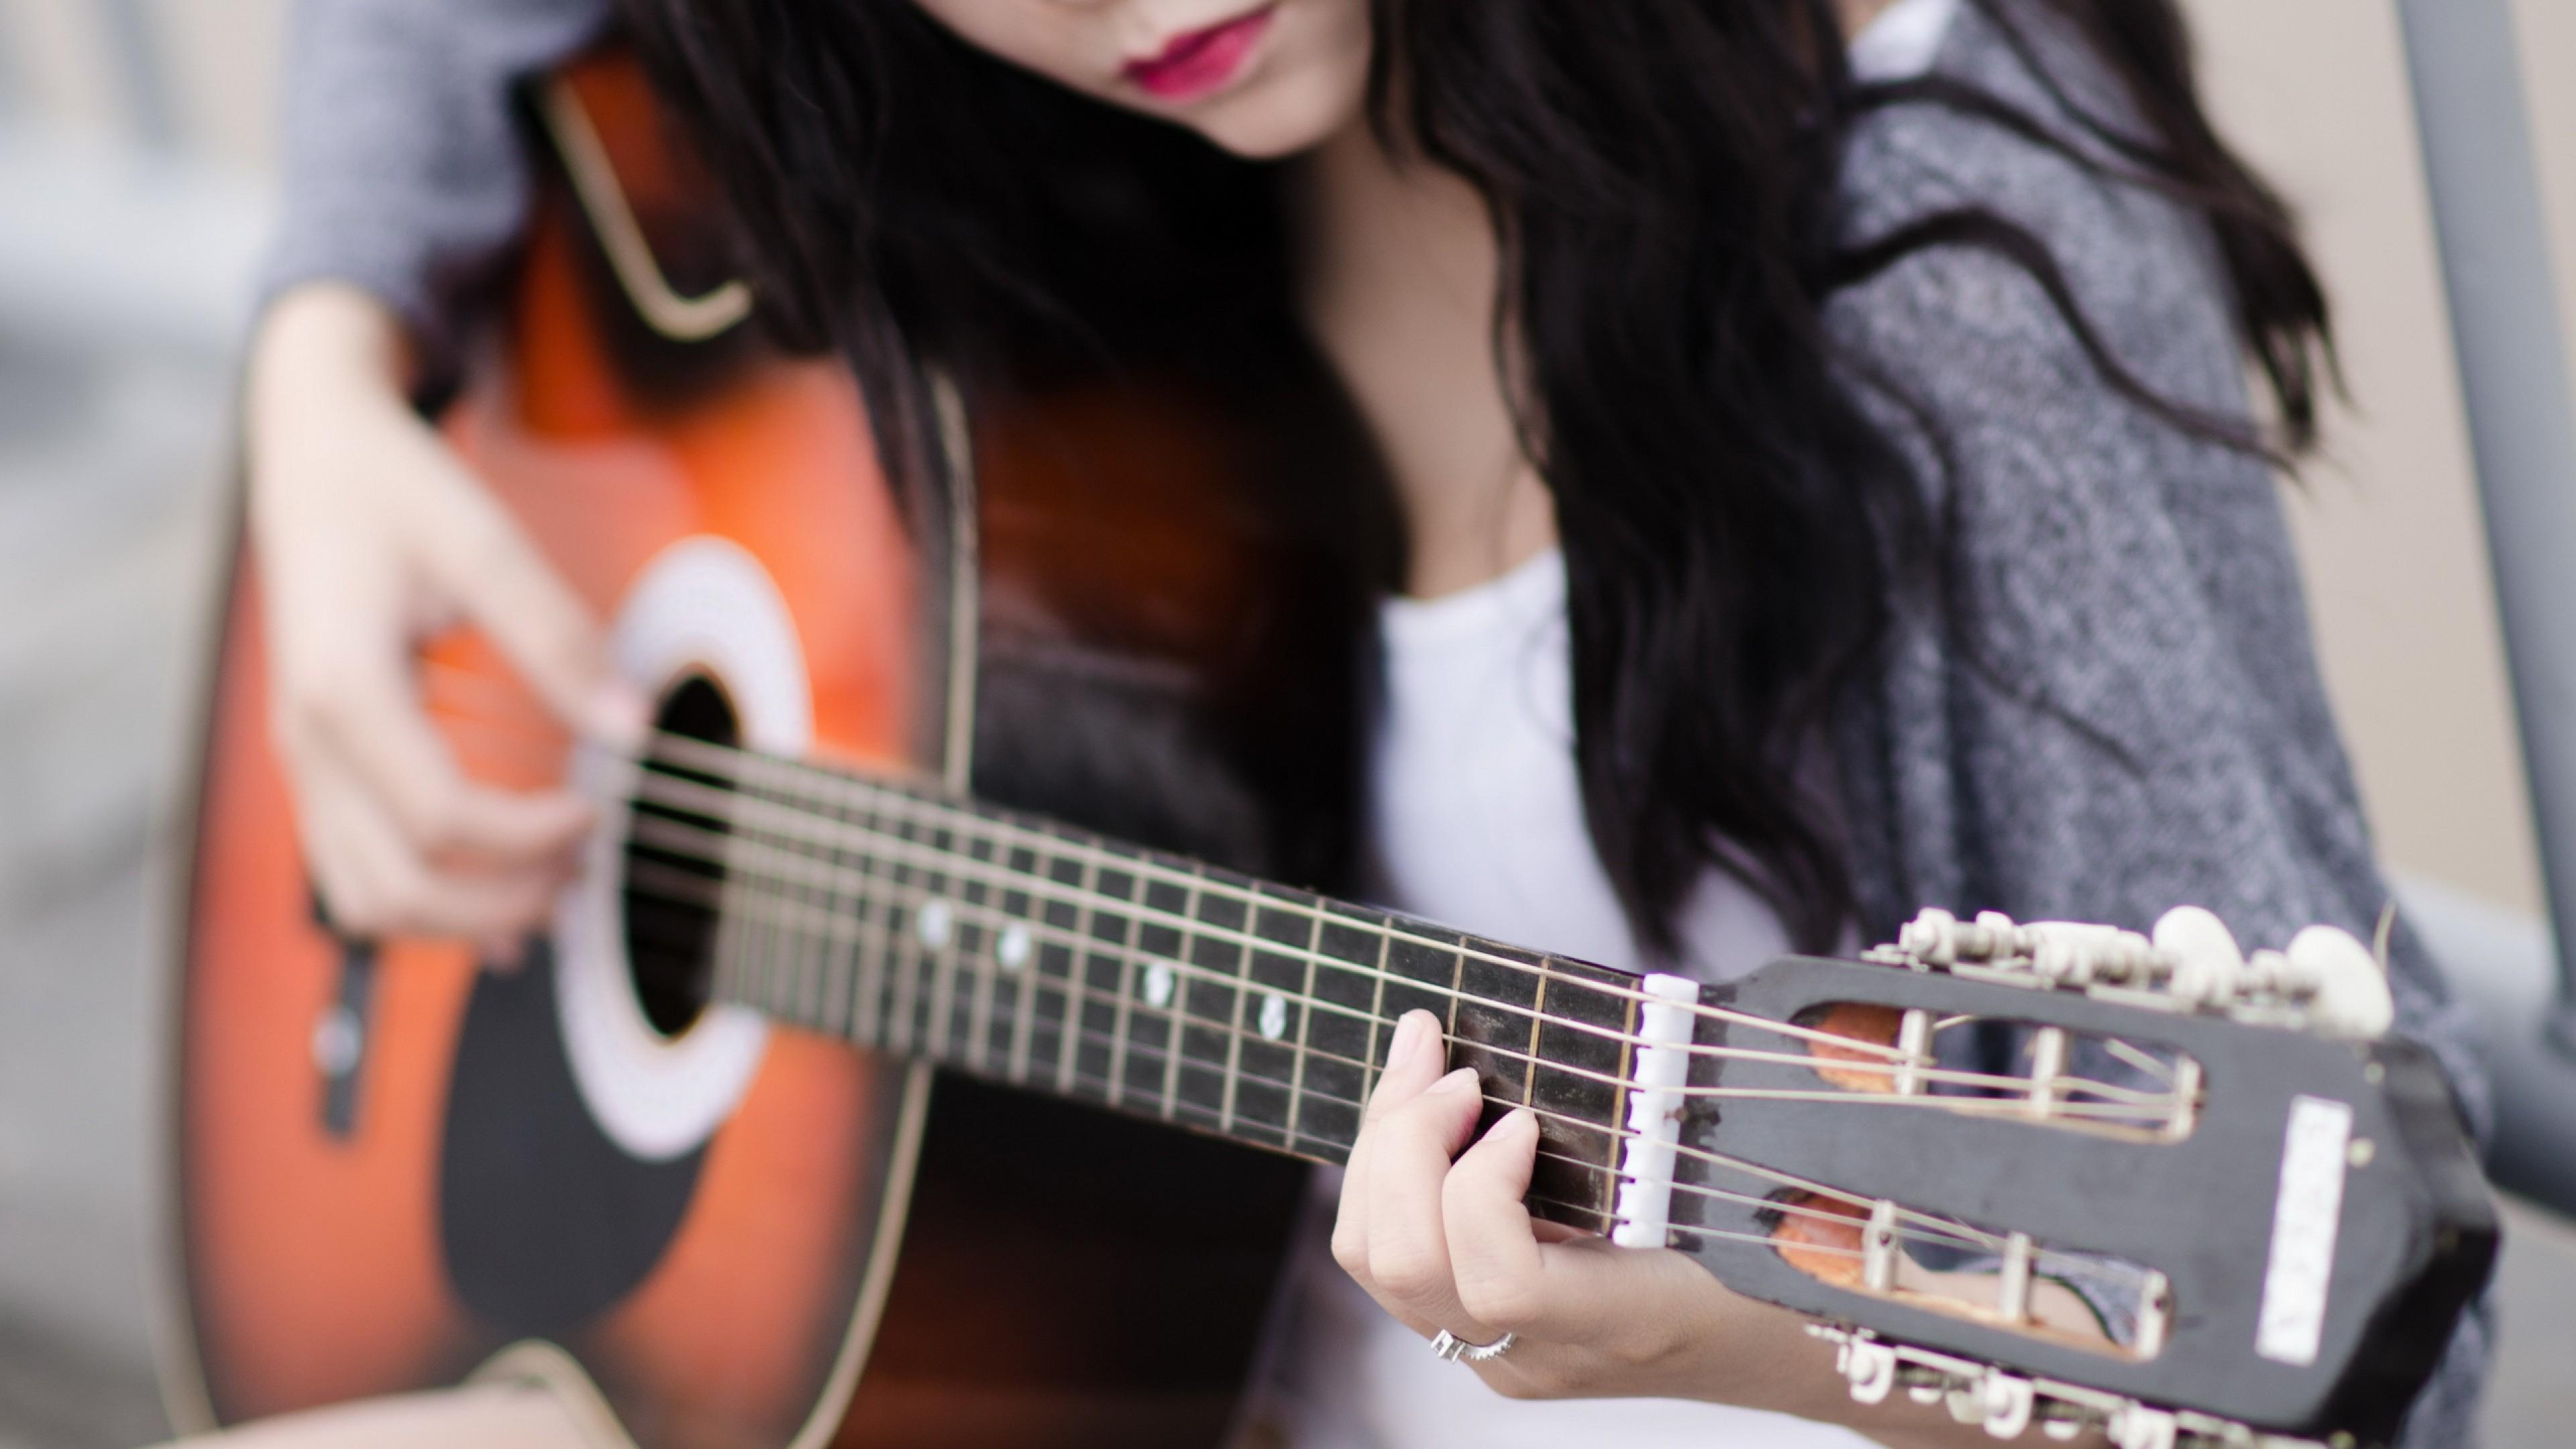 Res: 3840x2160, Girl Playing Guitar